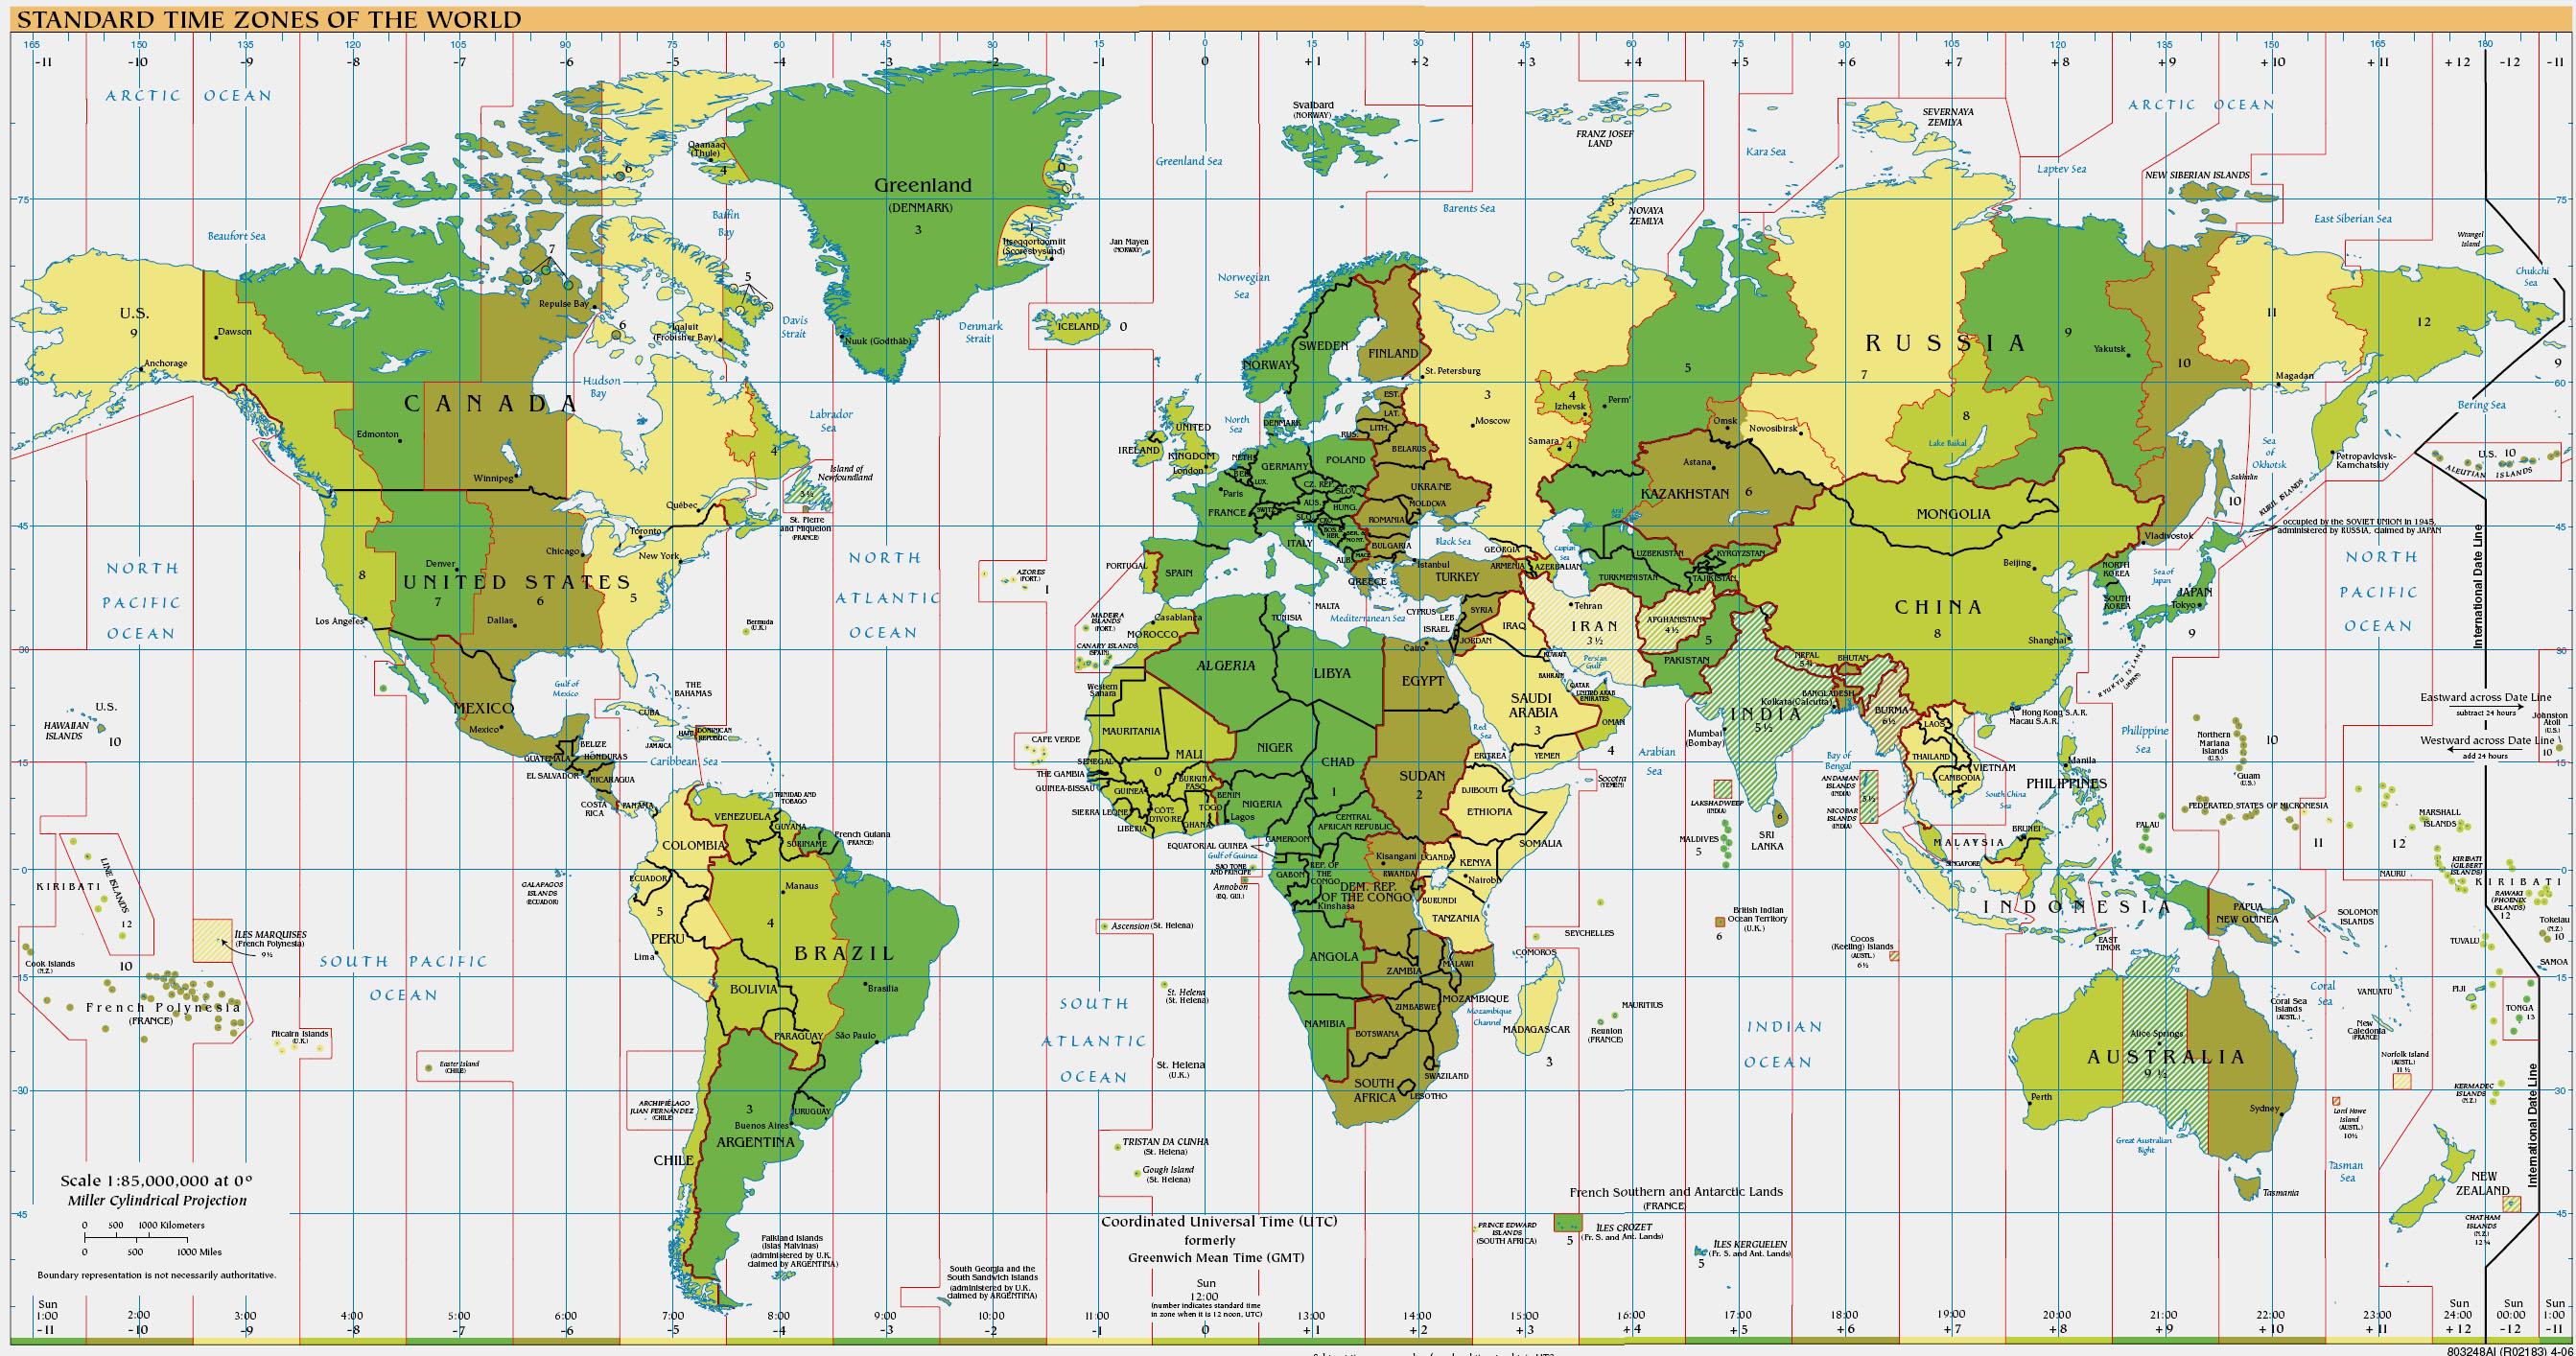 Time Zones of the World | Google Maps World Gazetteer ...